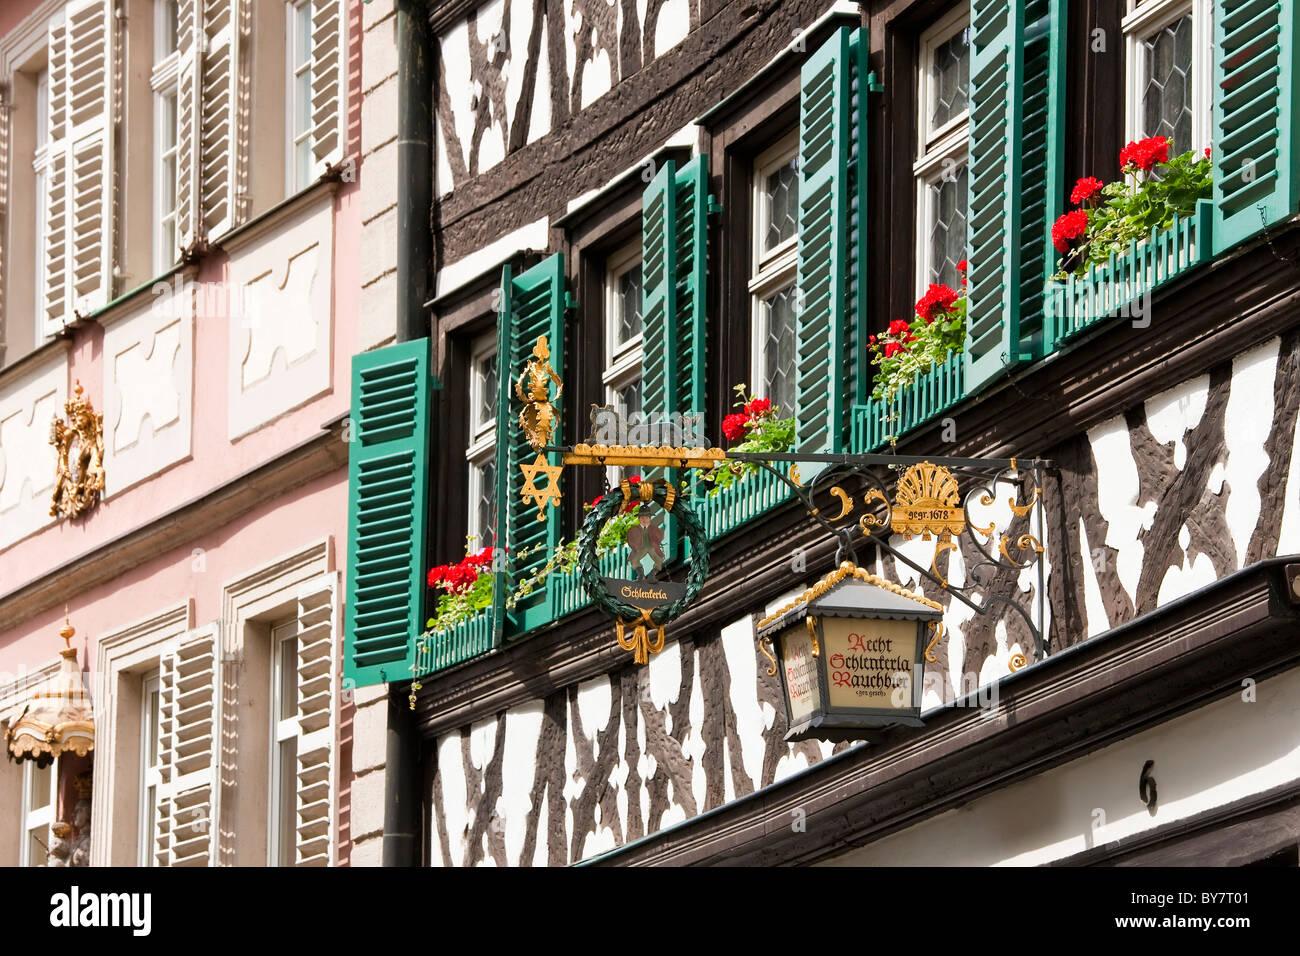 Pub or Inn sign, Bamberg, Germany - Stock Image